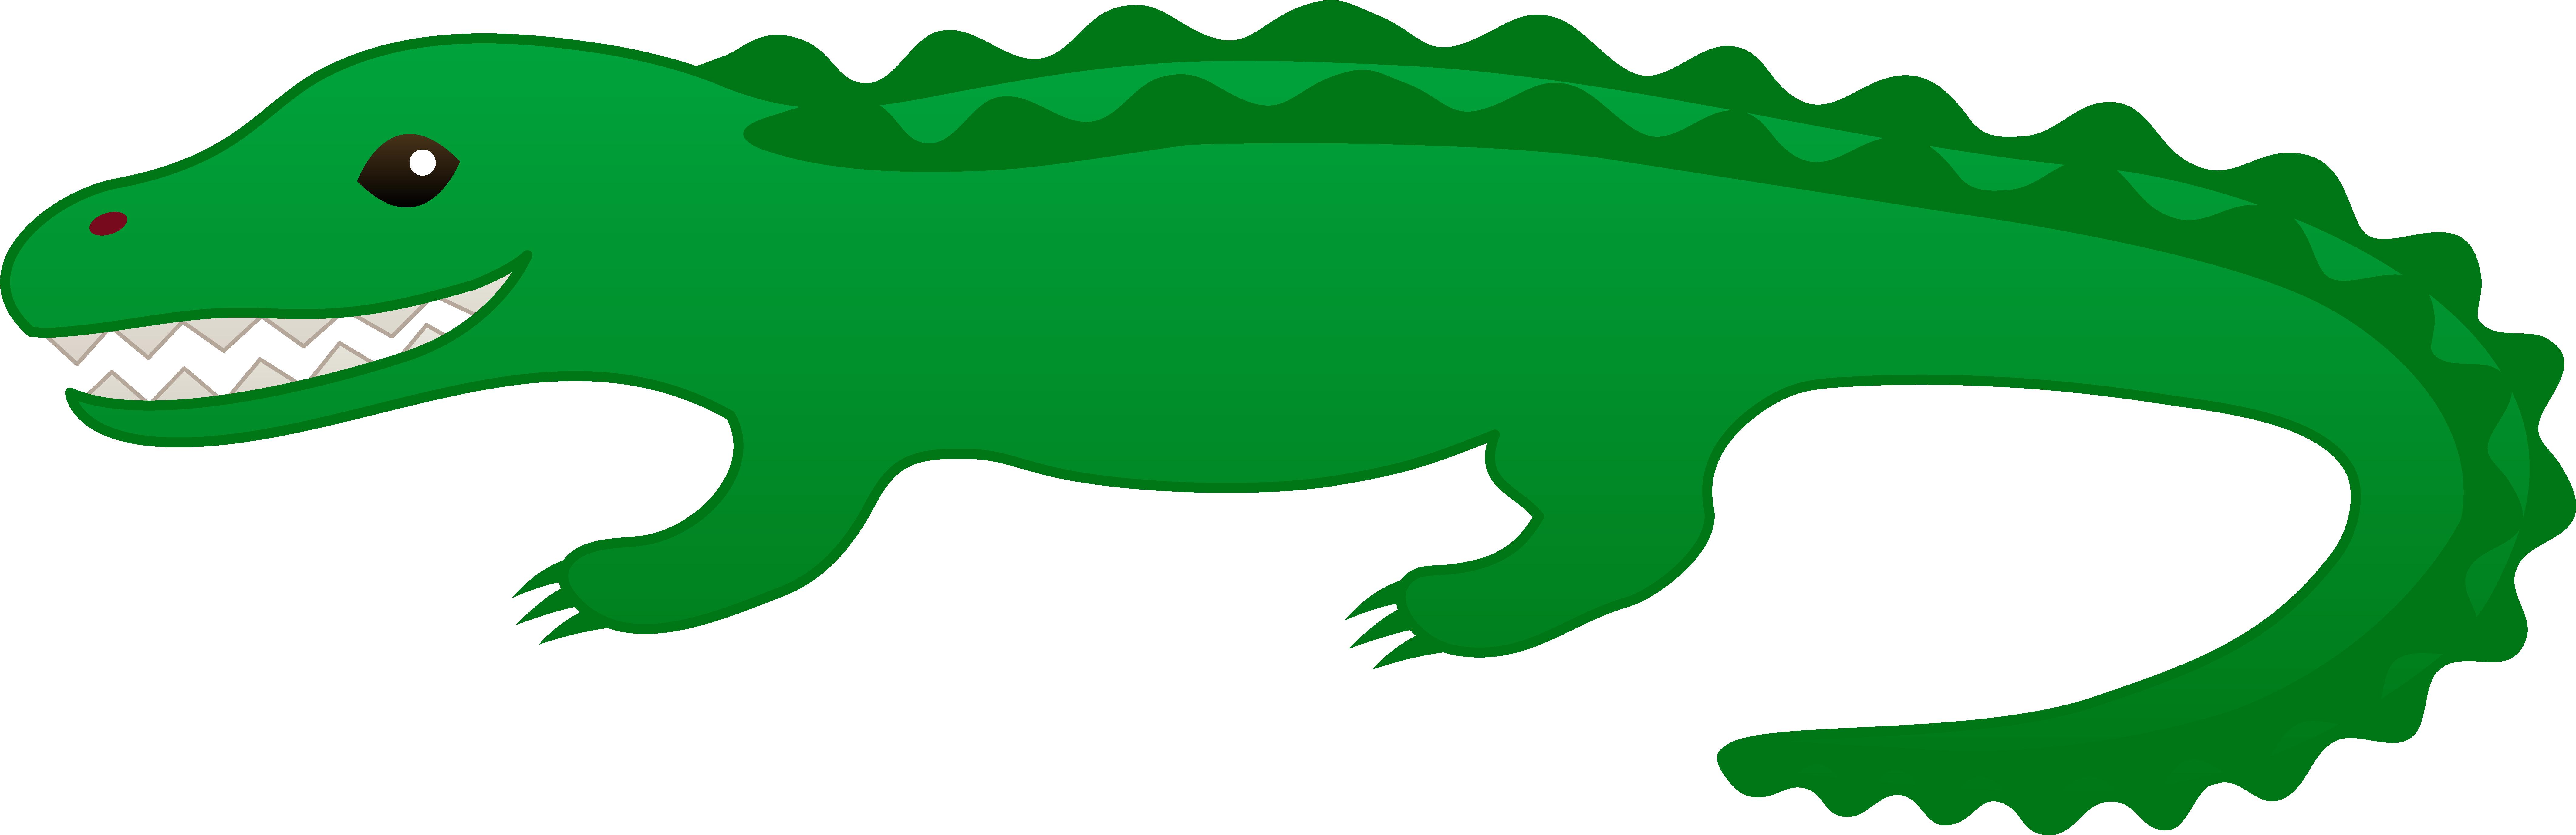 free animated alligator clipart - photo #10